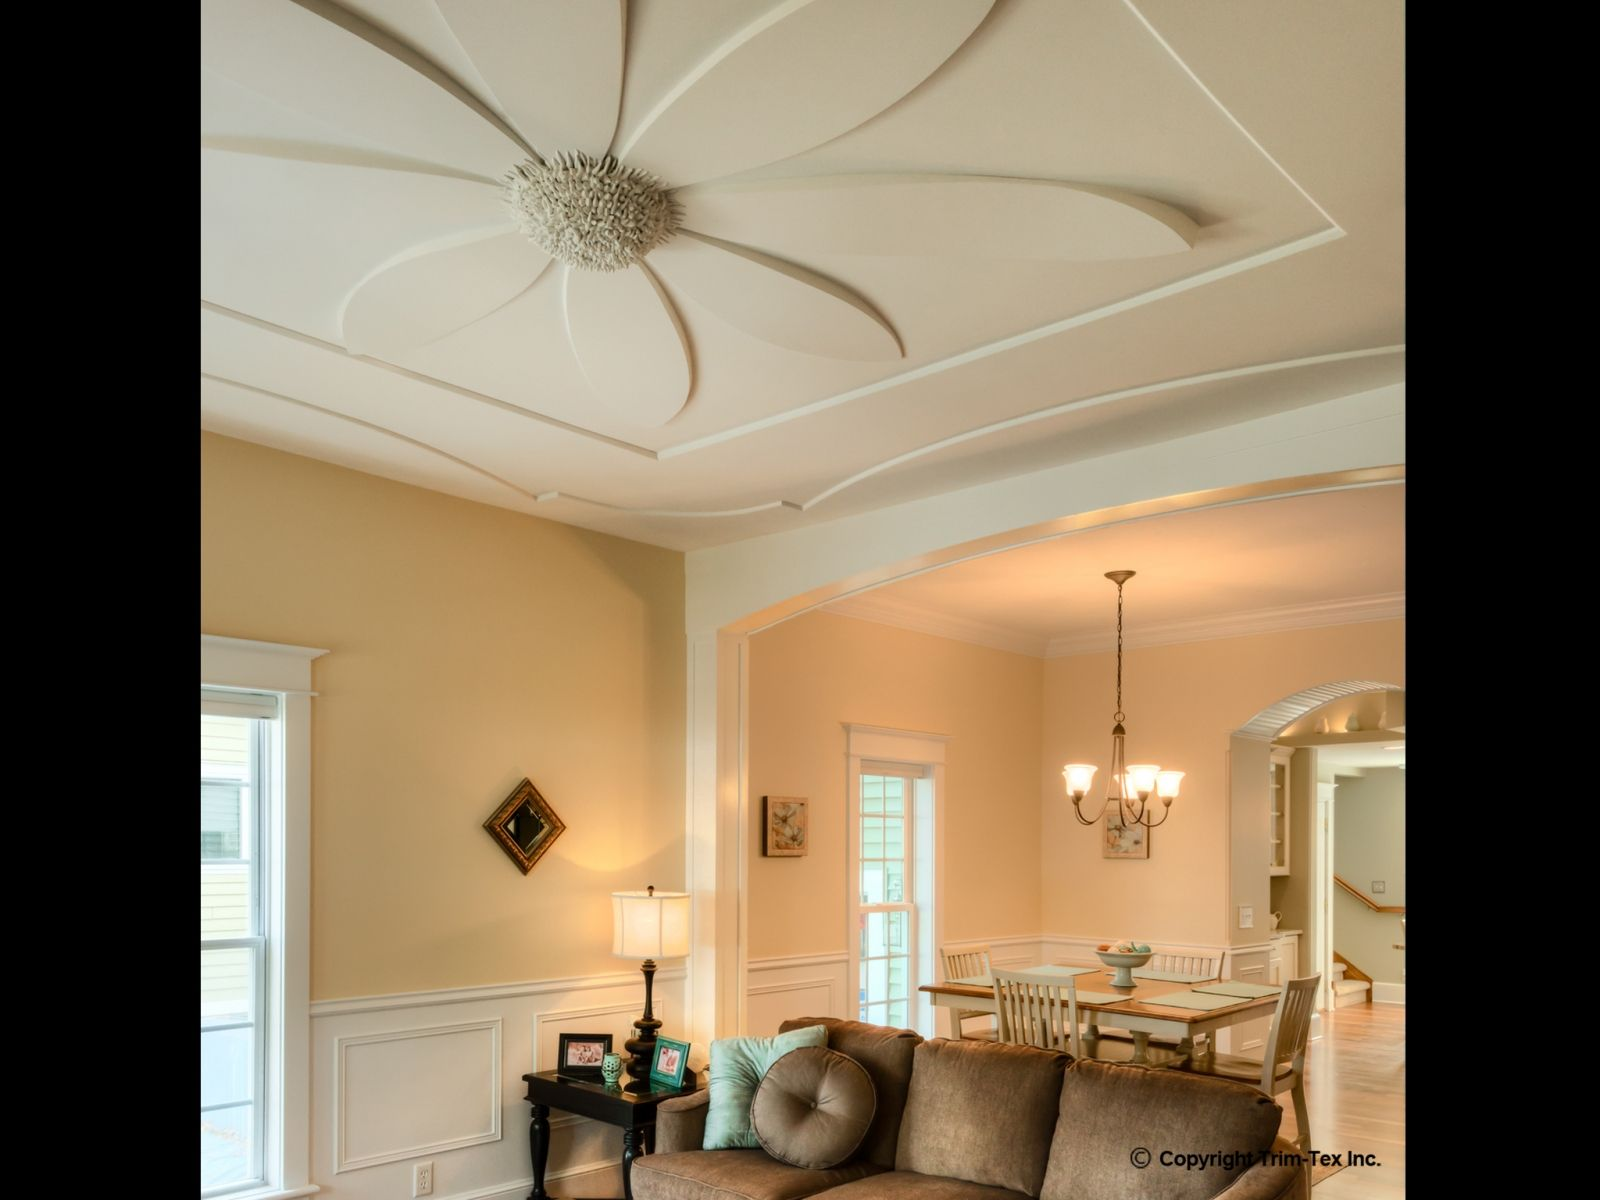 design u bold fyponus beam beams welsh faux studiorhwelshdesignstudiocom rhpinterestcom wood ideas trends kitchen decorative and attachment ceiling ceilings